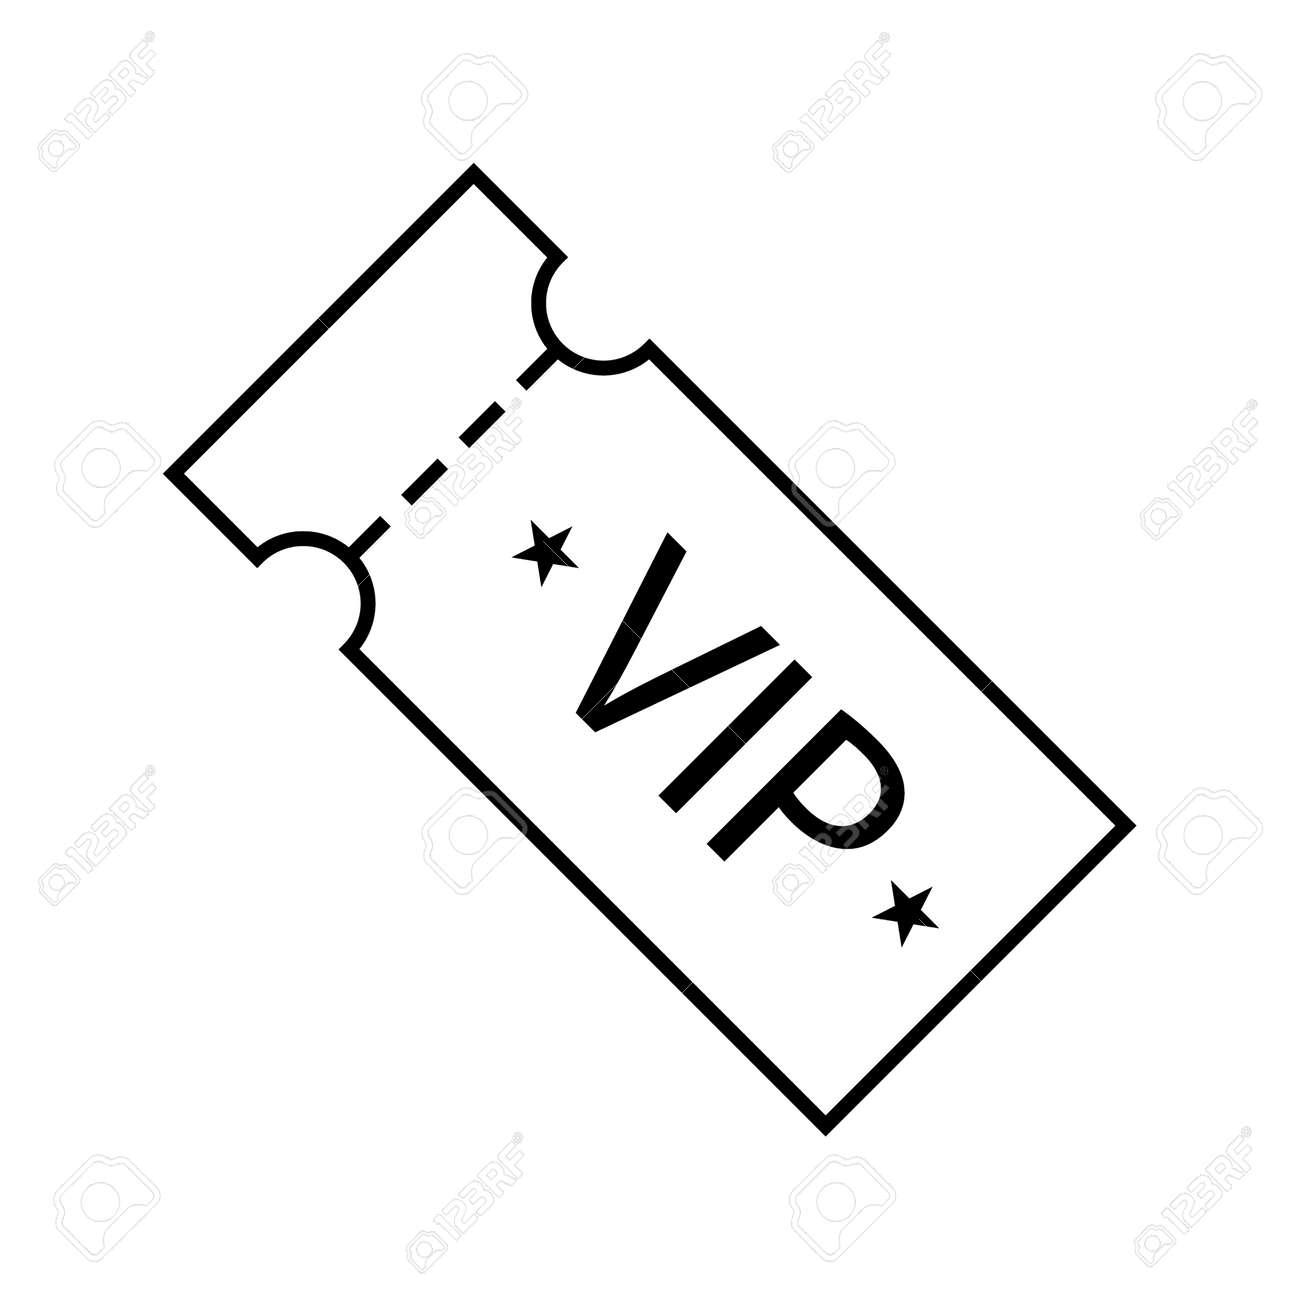 Vector icon of vip ticket - 172535582